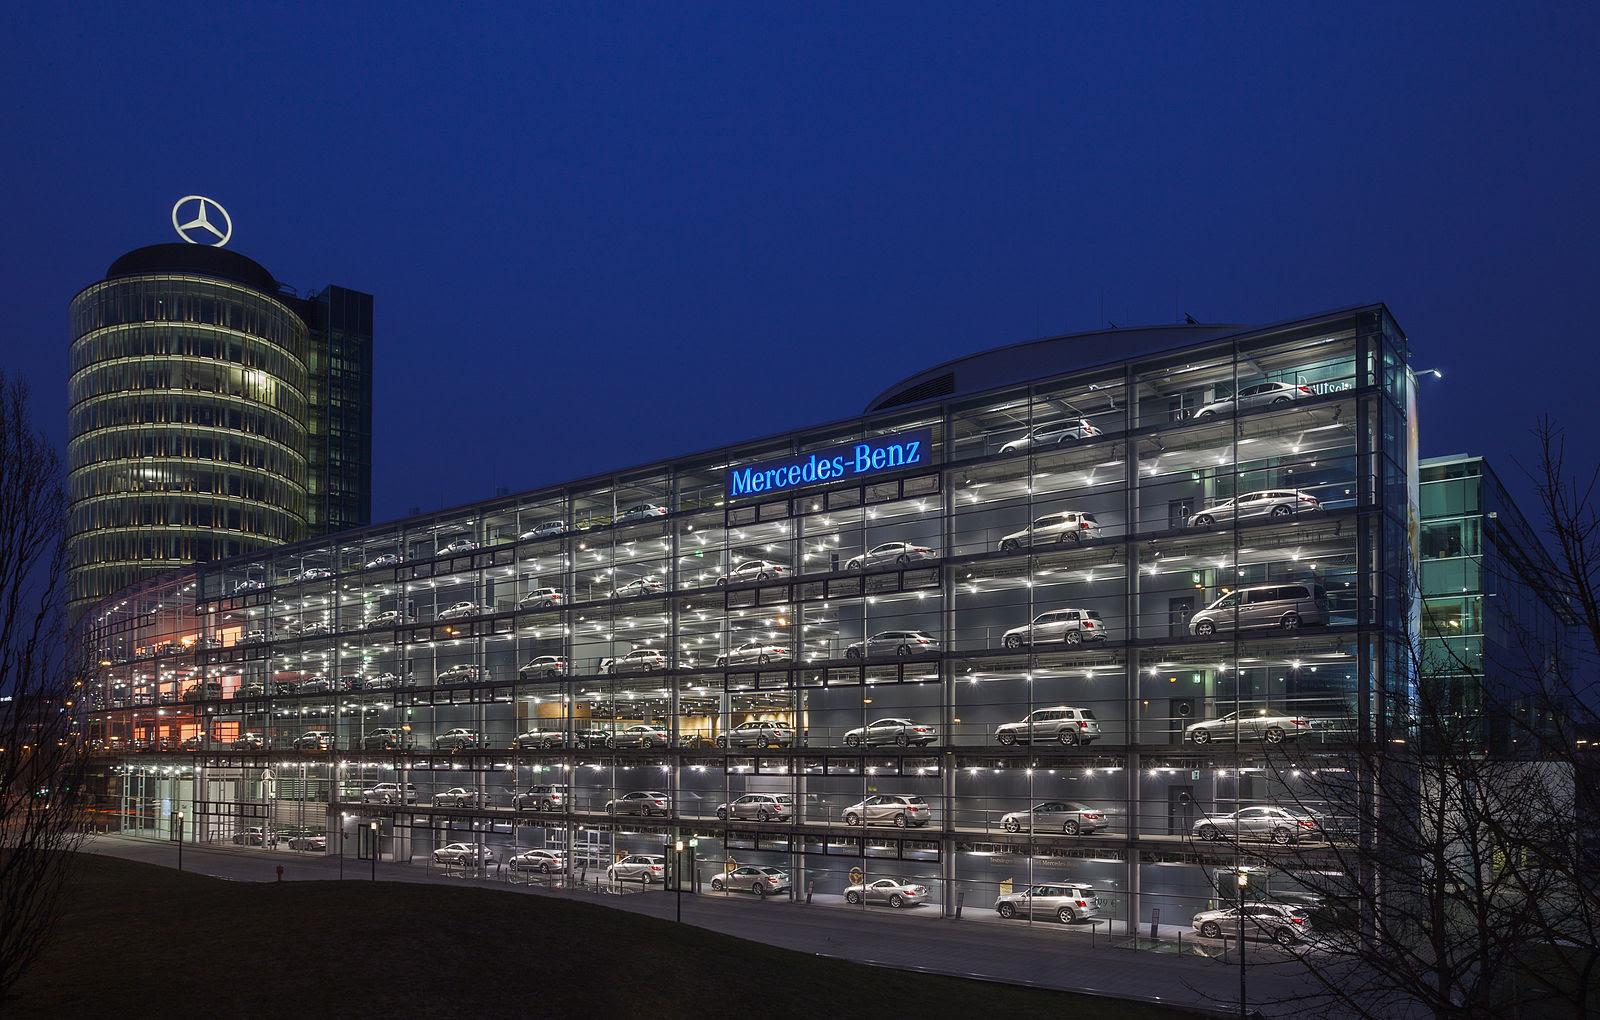 Mercedes Benz Dealership in Munich Germany [1600x1020 ...